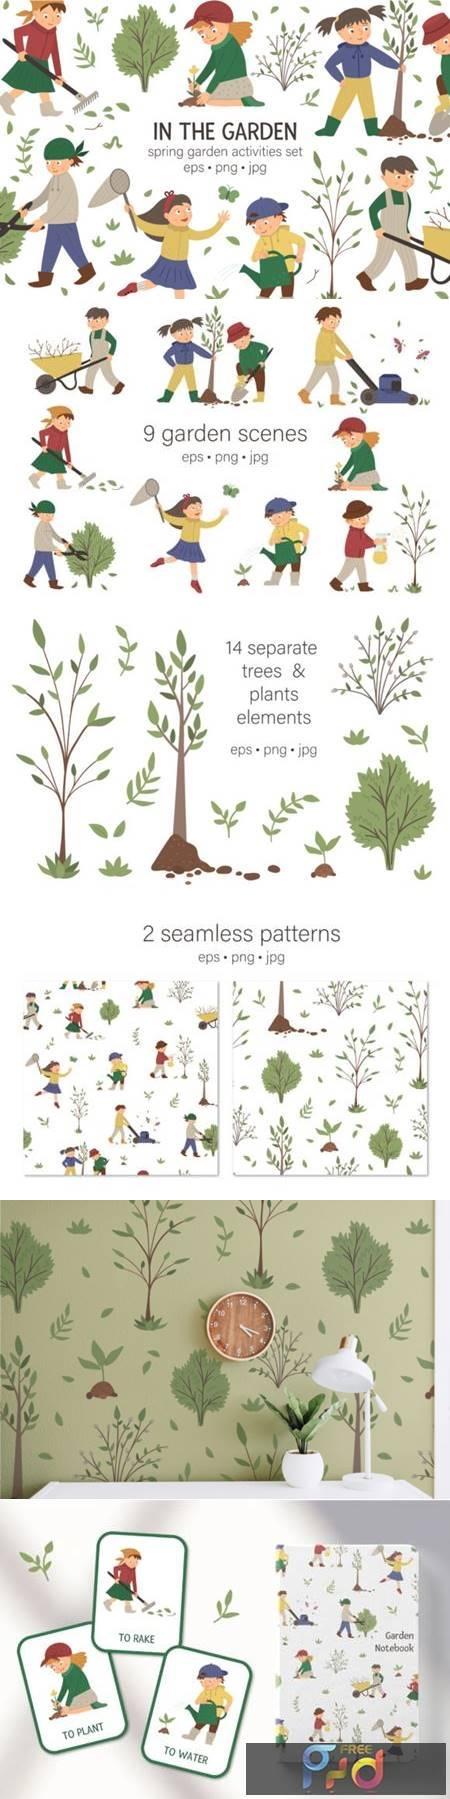 In the Garden 4327938 1